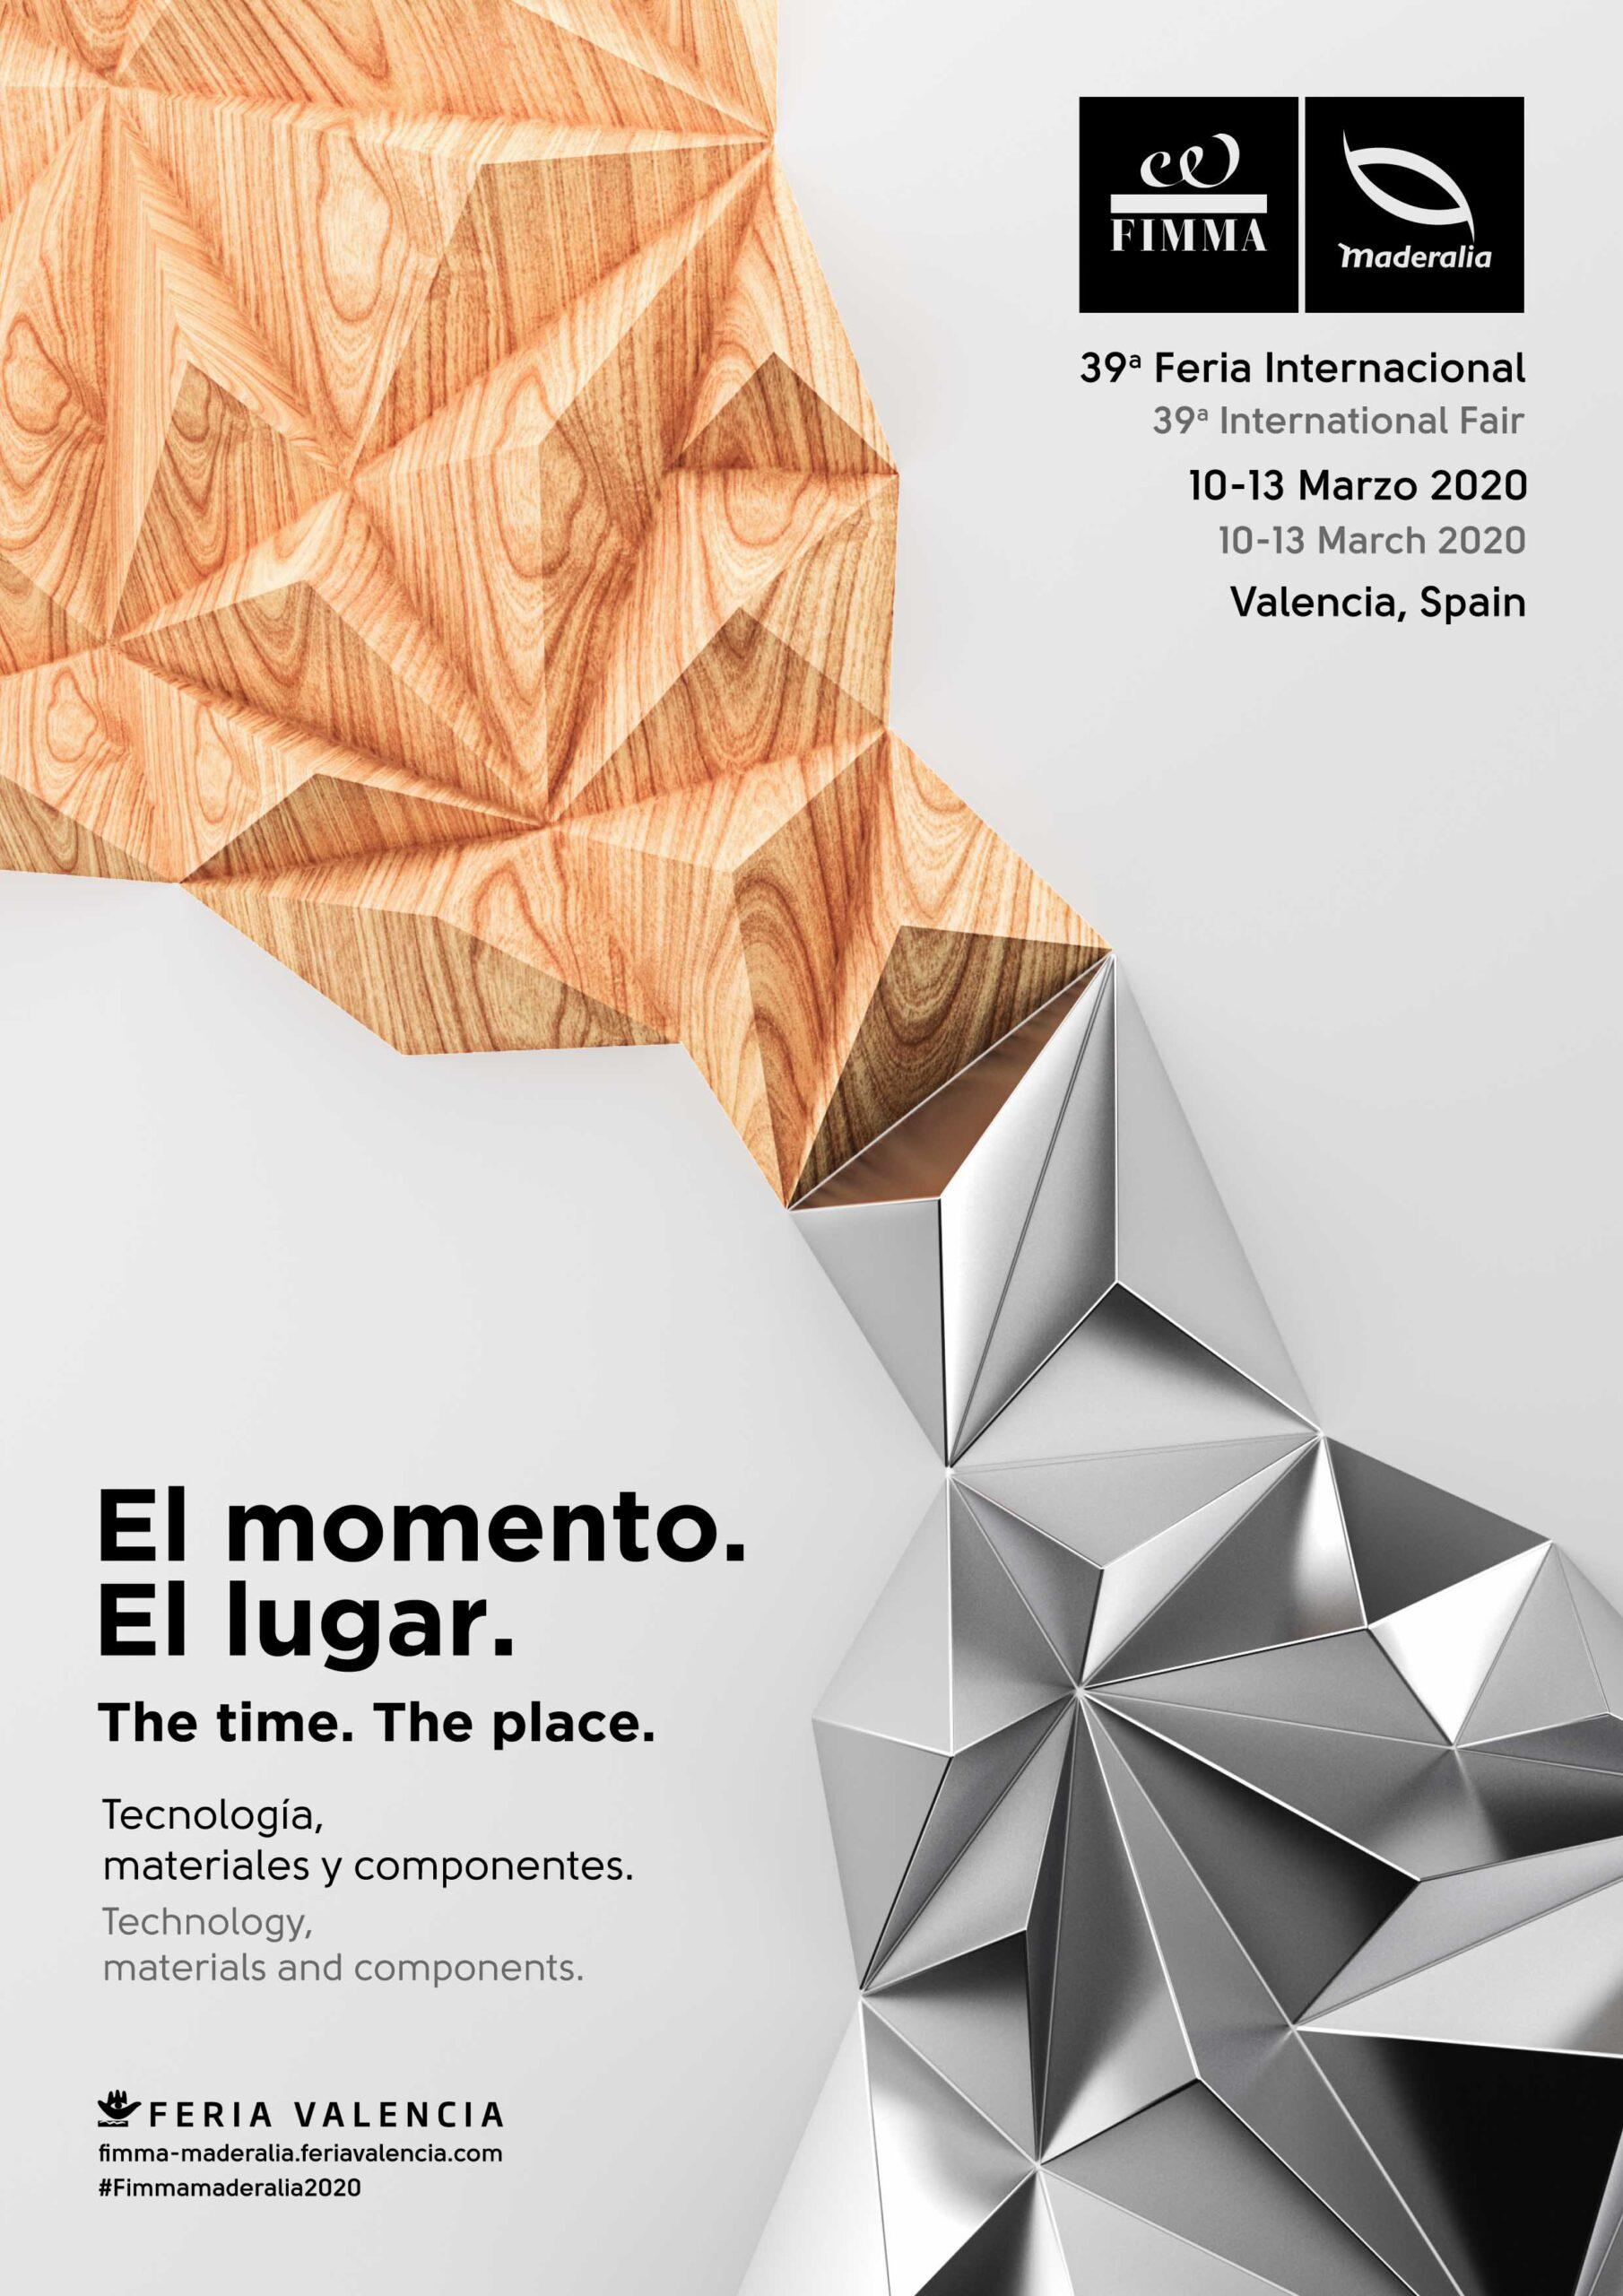 01 maderalia 2020 - mejoresmarcas.es